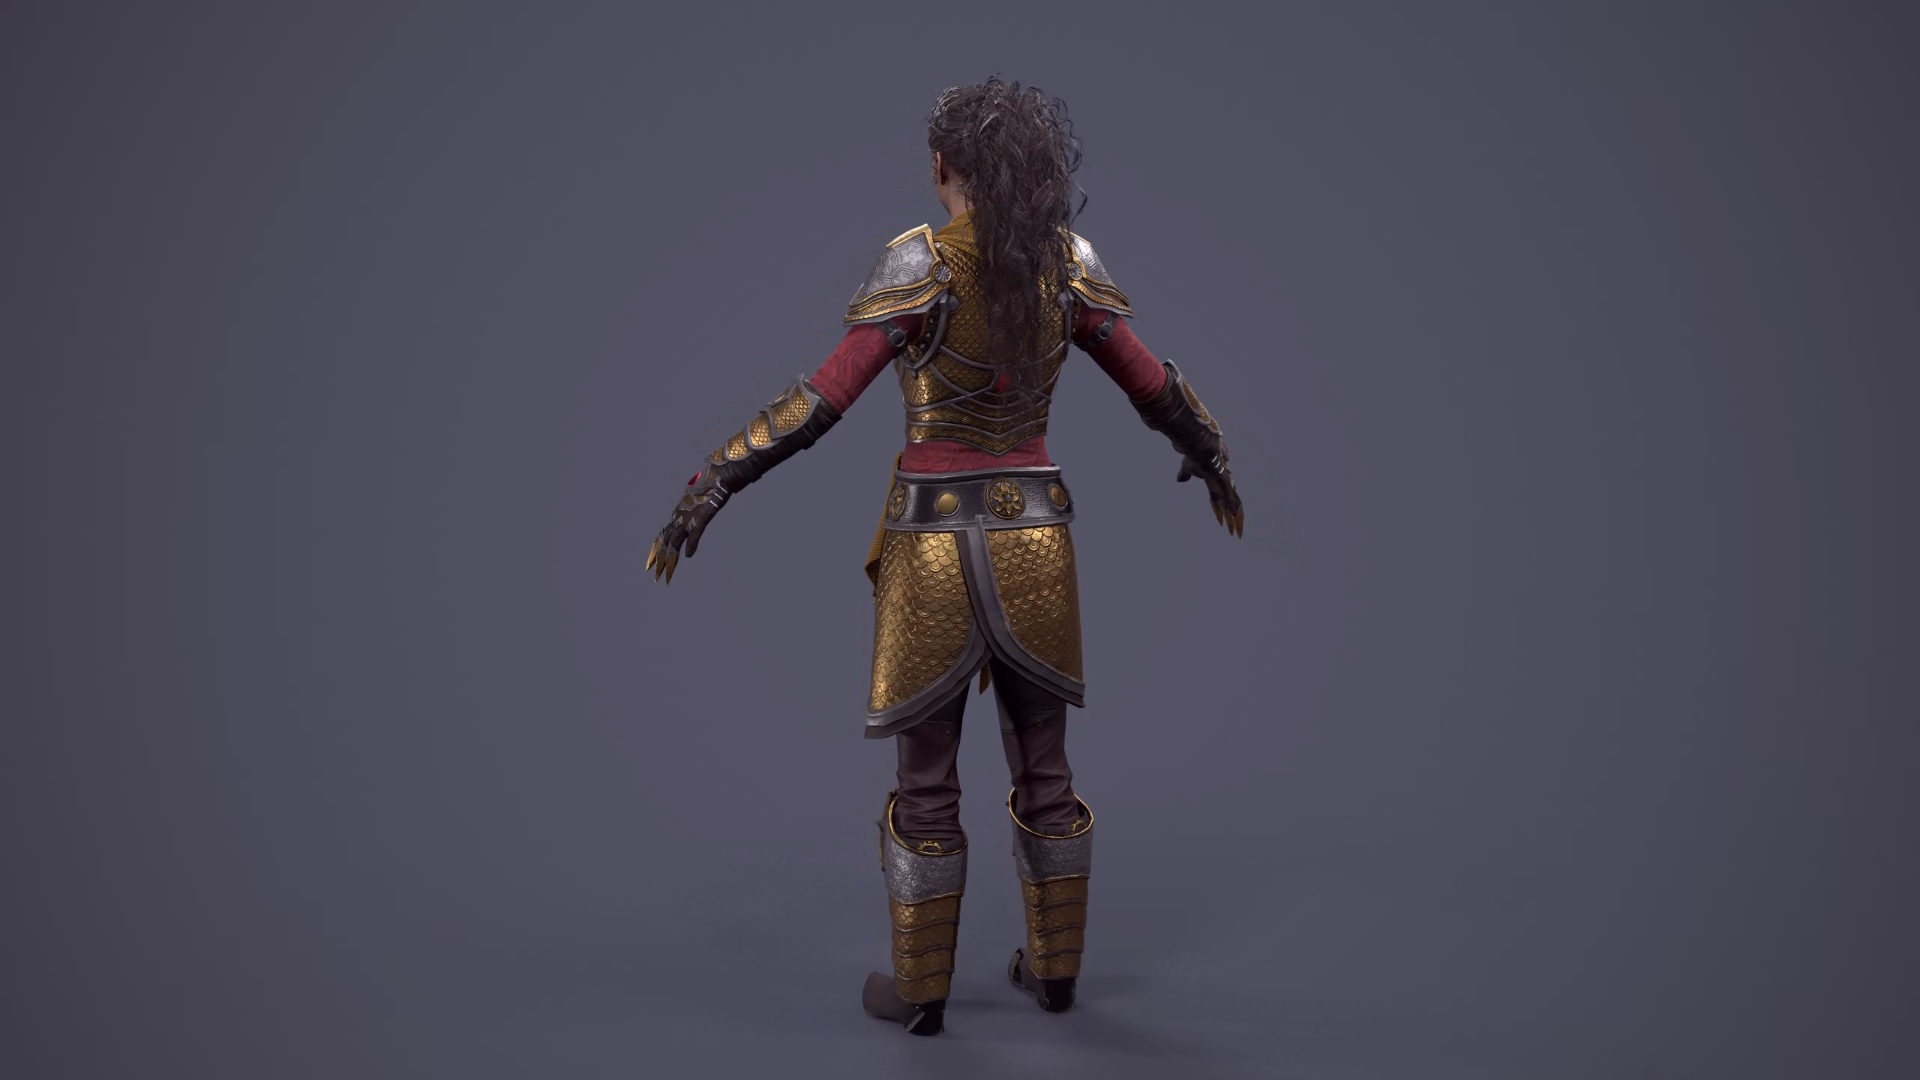 New character hair model revealed